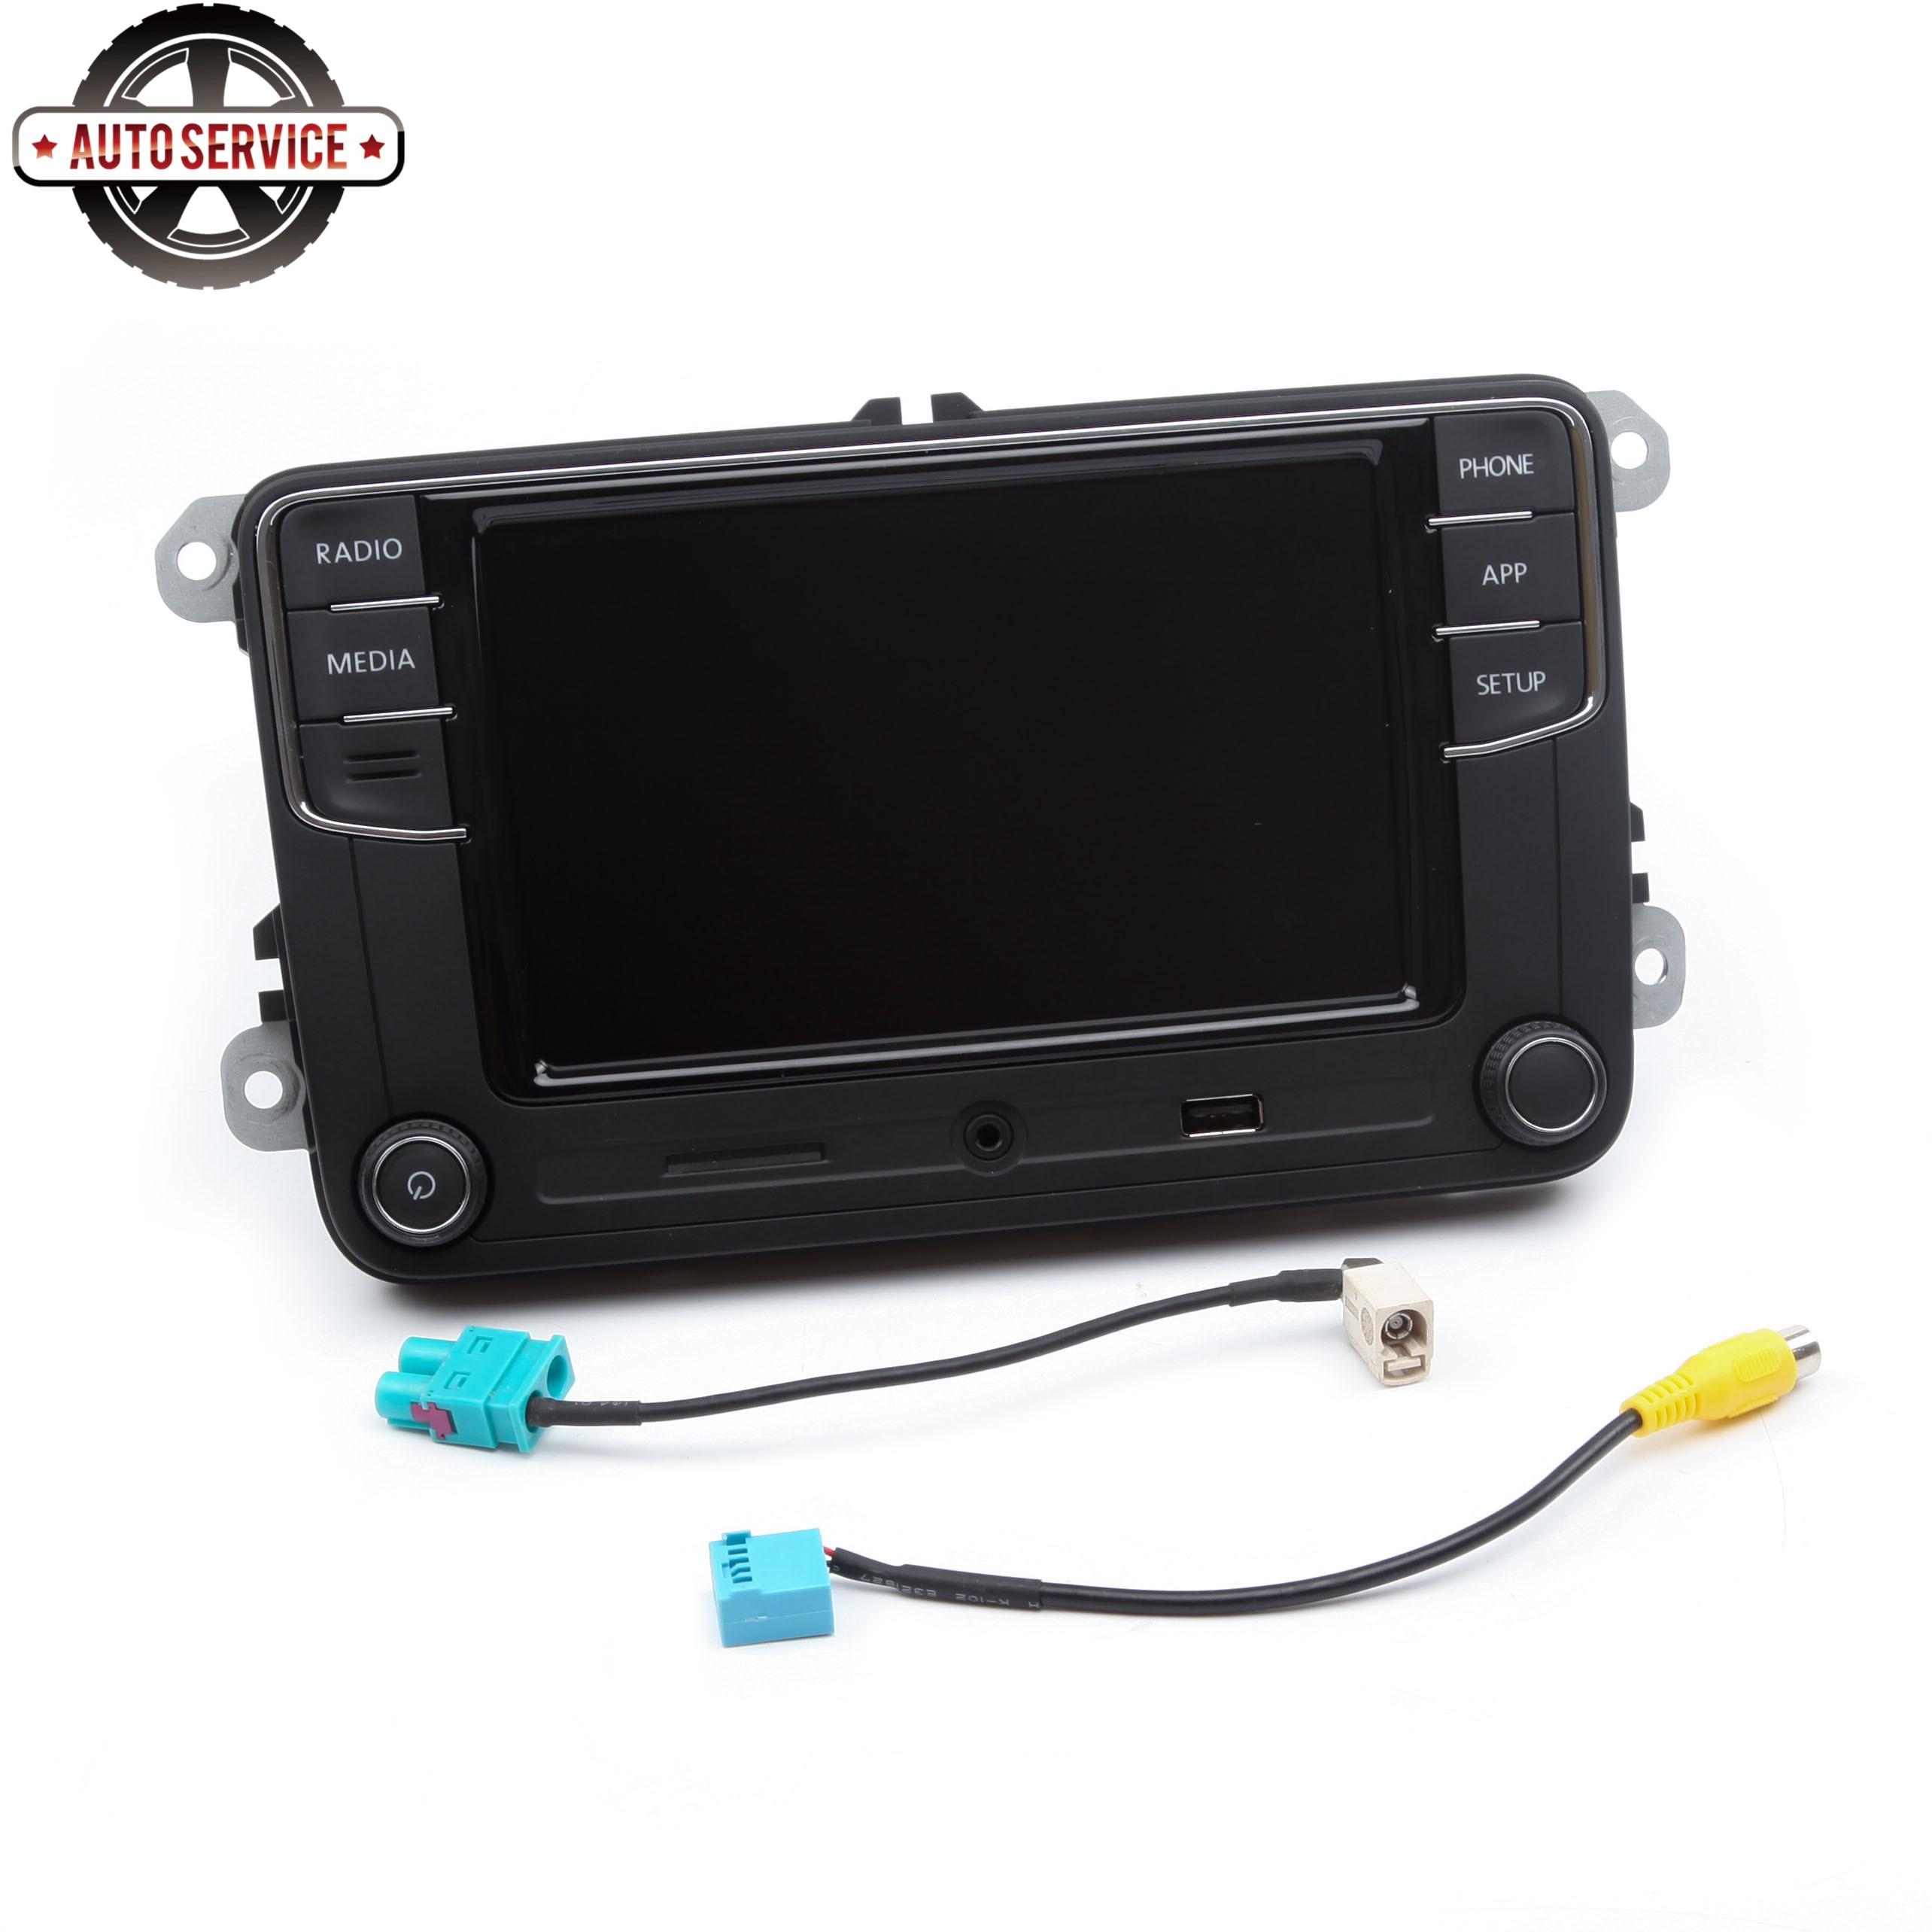 Nuevo RCD330 más RCD330G Carplay MIB 6,5 pulgadas Radio para Jetta MK5 MK6 CC Passat 6RD035187B 1GB de RAM cámara de Vista trasera Bluetooth USB - 4